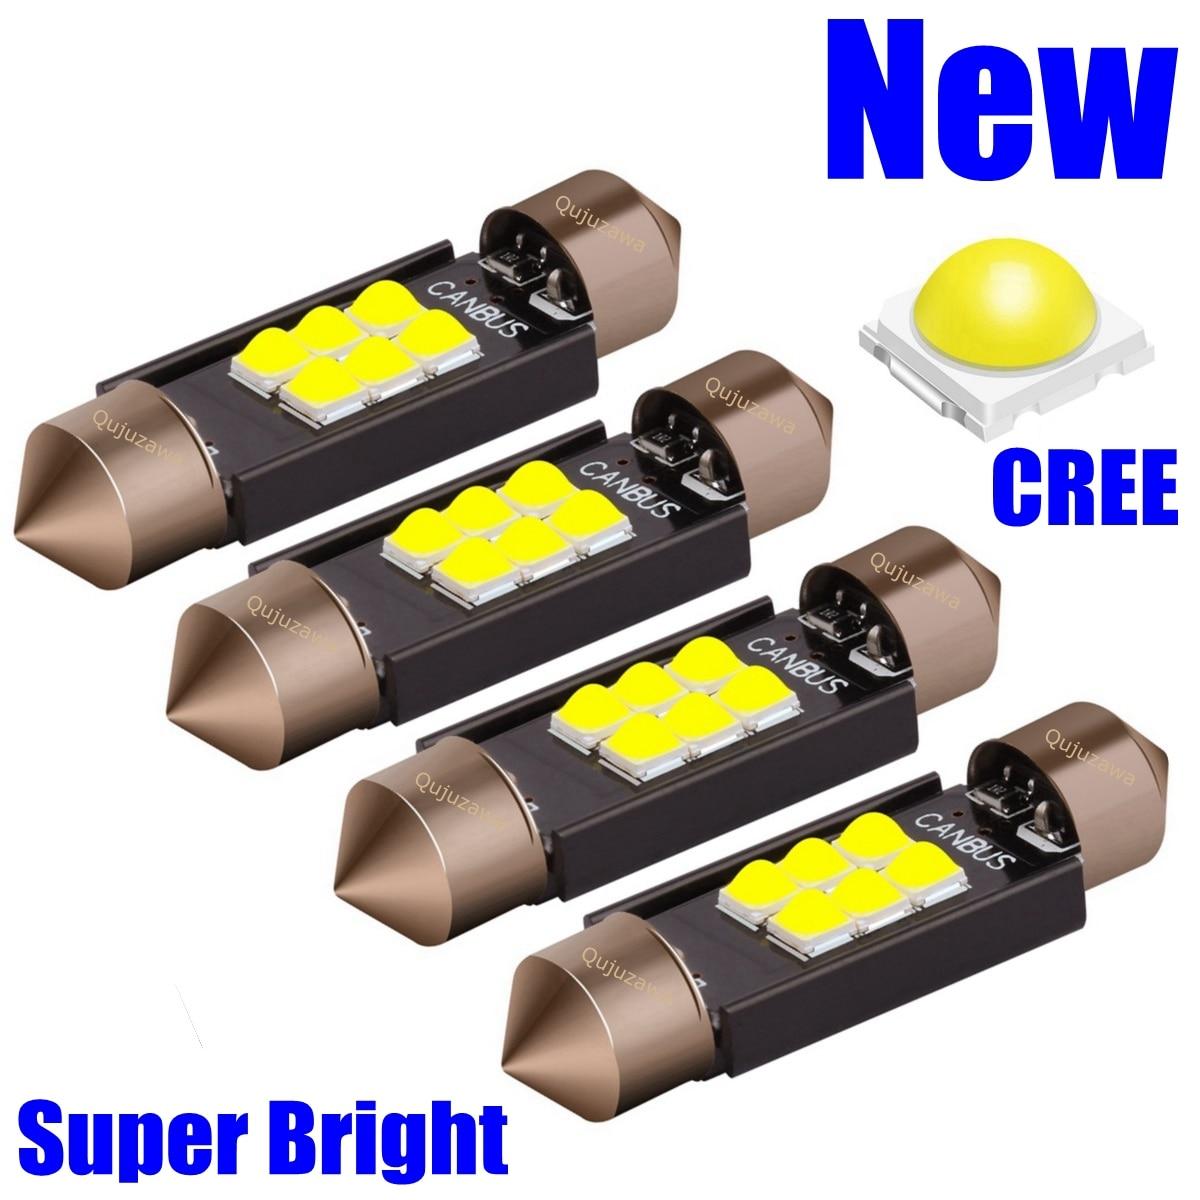 4 шт. гирлянда 31 мм, 36 мм, 39 мм, 41 мм, светодиодные лампы C5W, C10W, сверхъярсветодиодный светодиод, Canbus, без ошибок, для салона автомобиля, лампа зад...